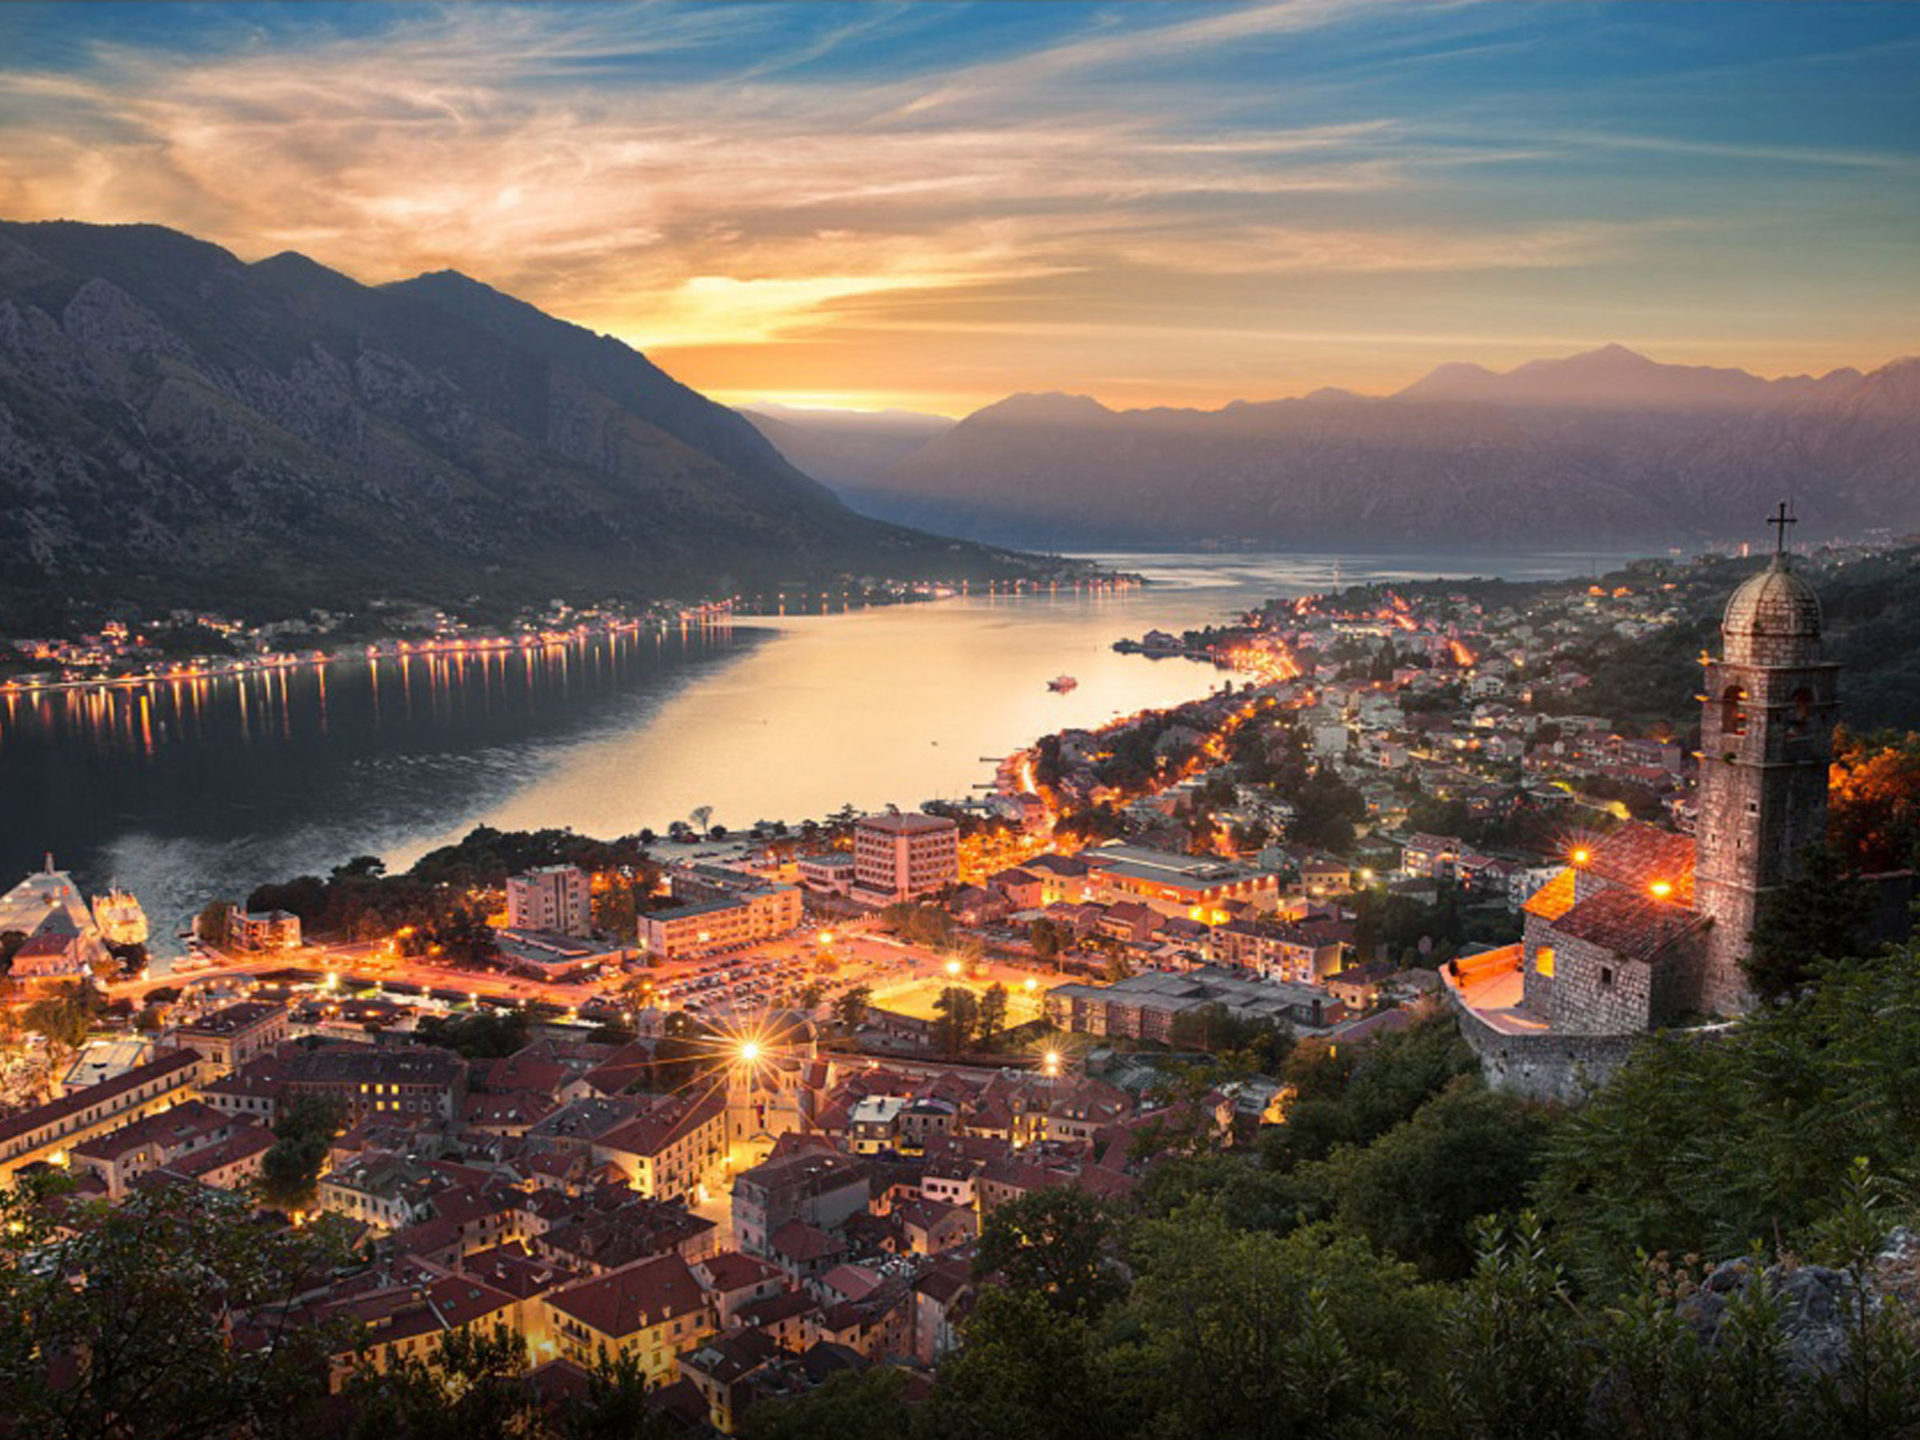 Iphone X New York Wallpaper Montenegro City Kotor At Night Desktop Wallpaper Hd